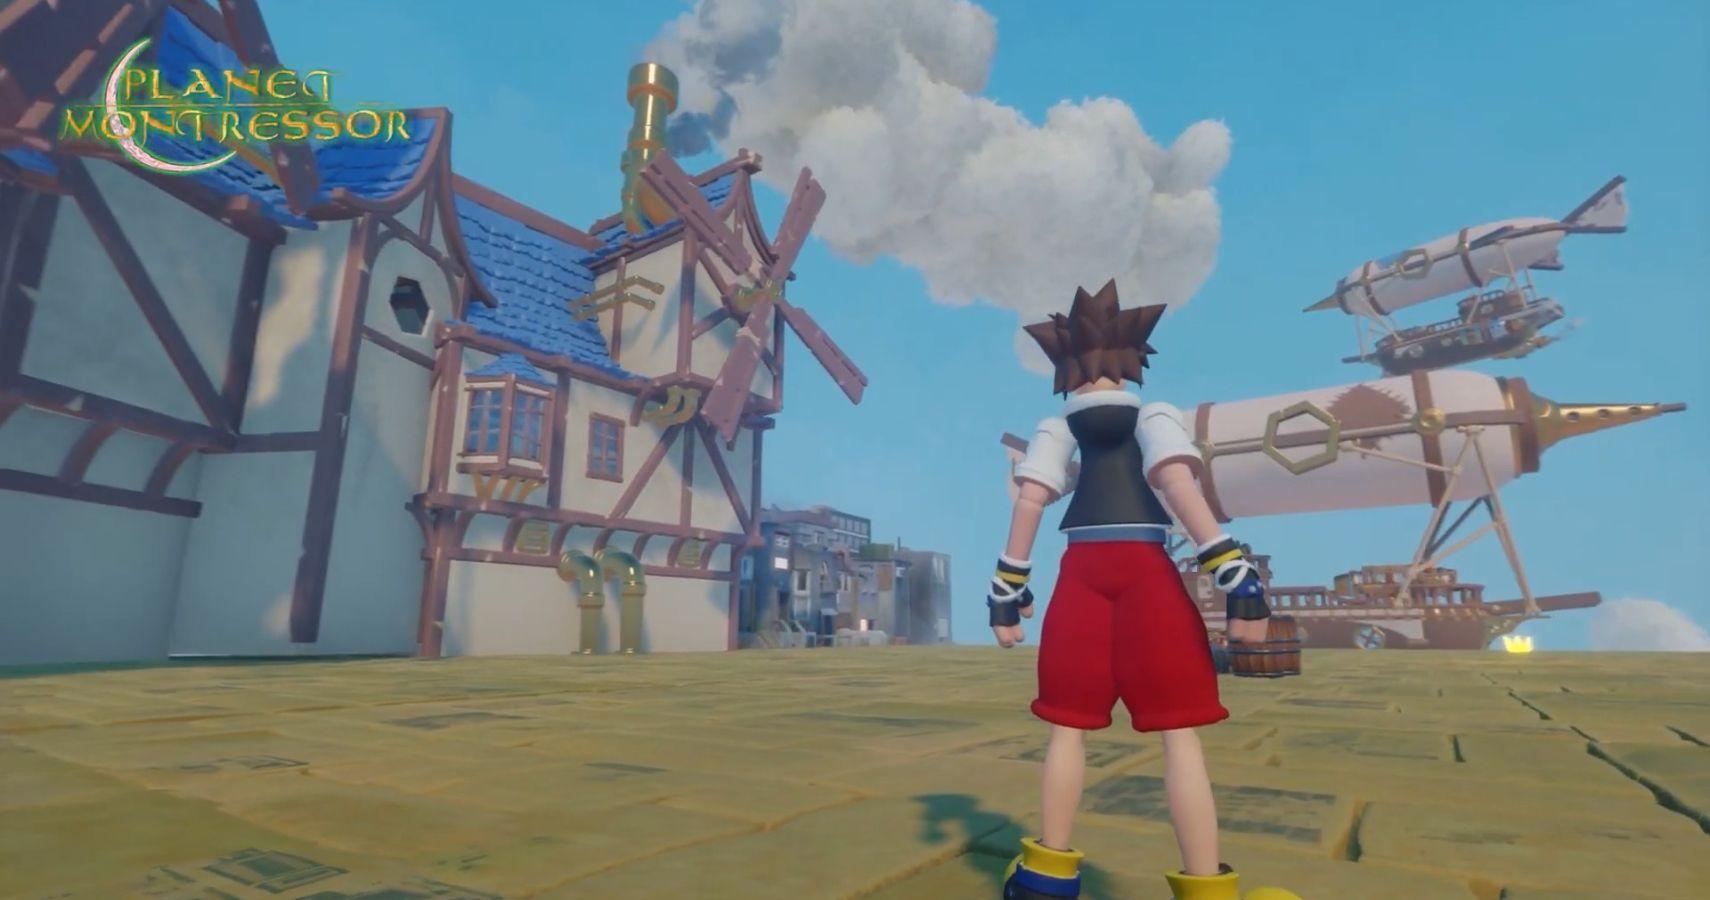 Kingdom Hearts Fan Shows What A Treasure Planet World Would Look Like In Dreams